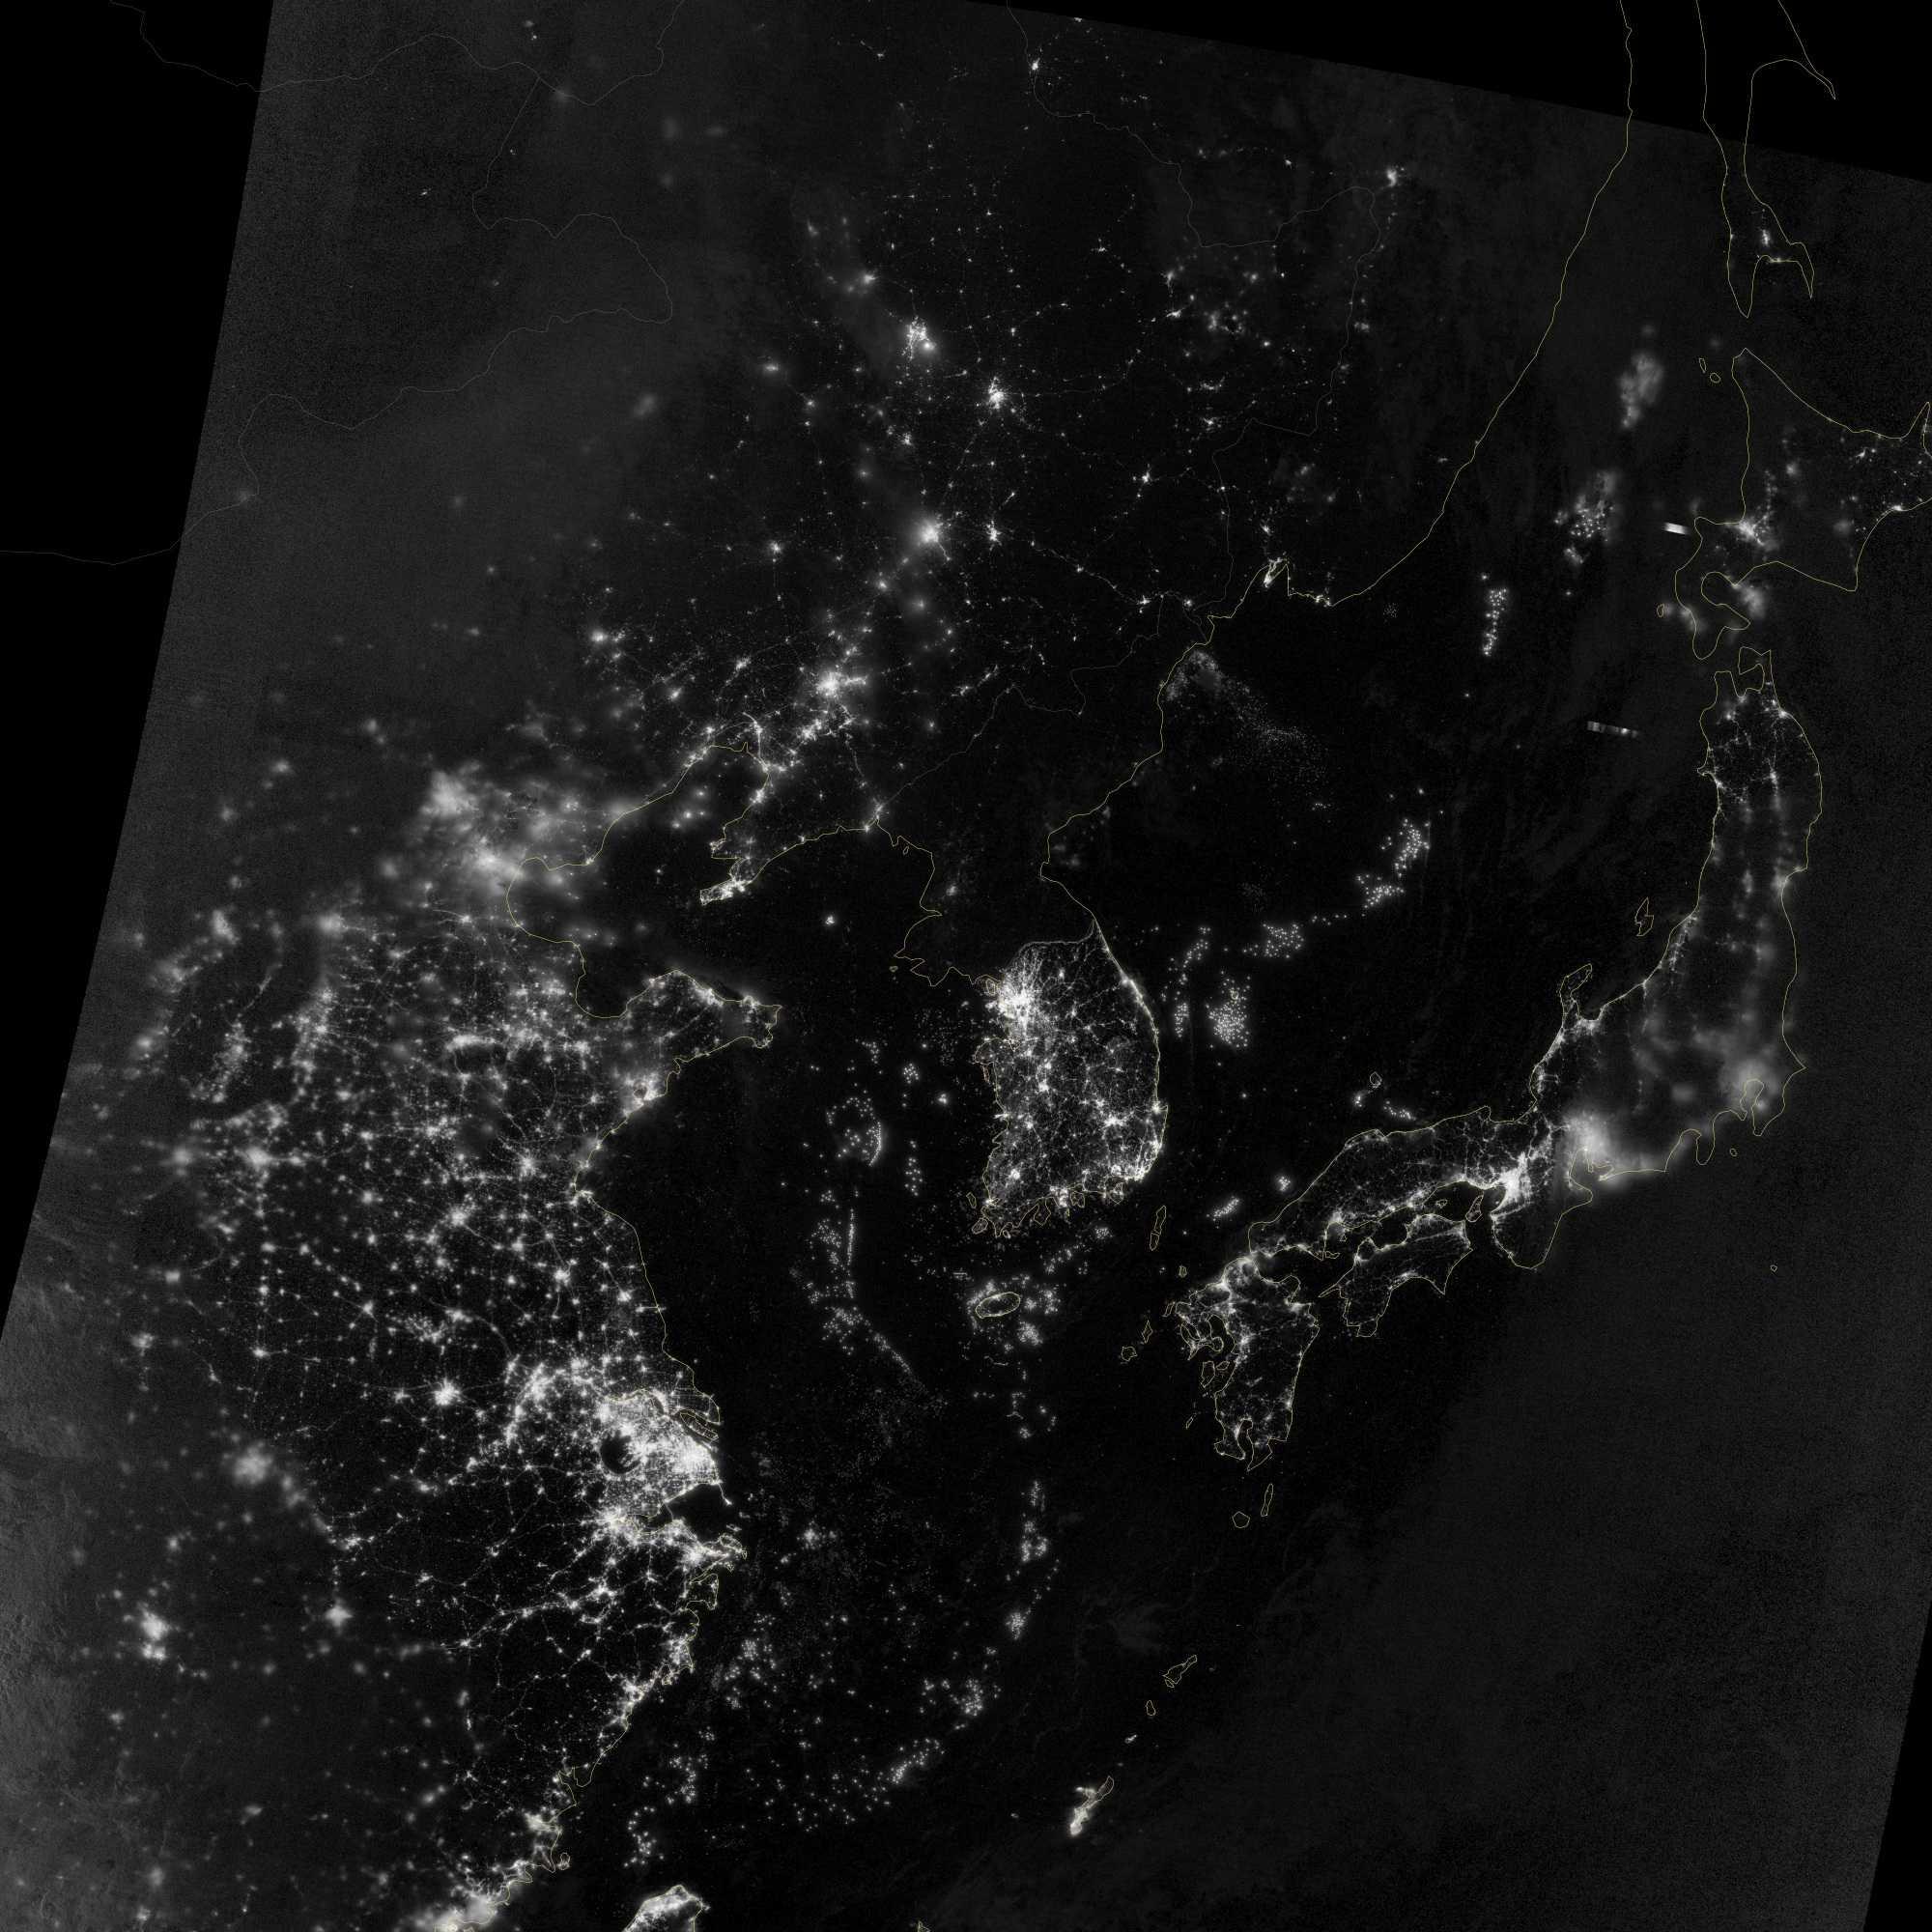 Satellitenaufnahme bei Nacht: China, Korea, Japan